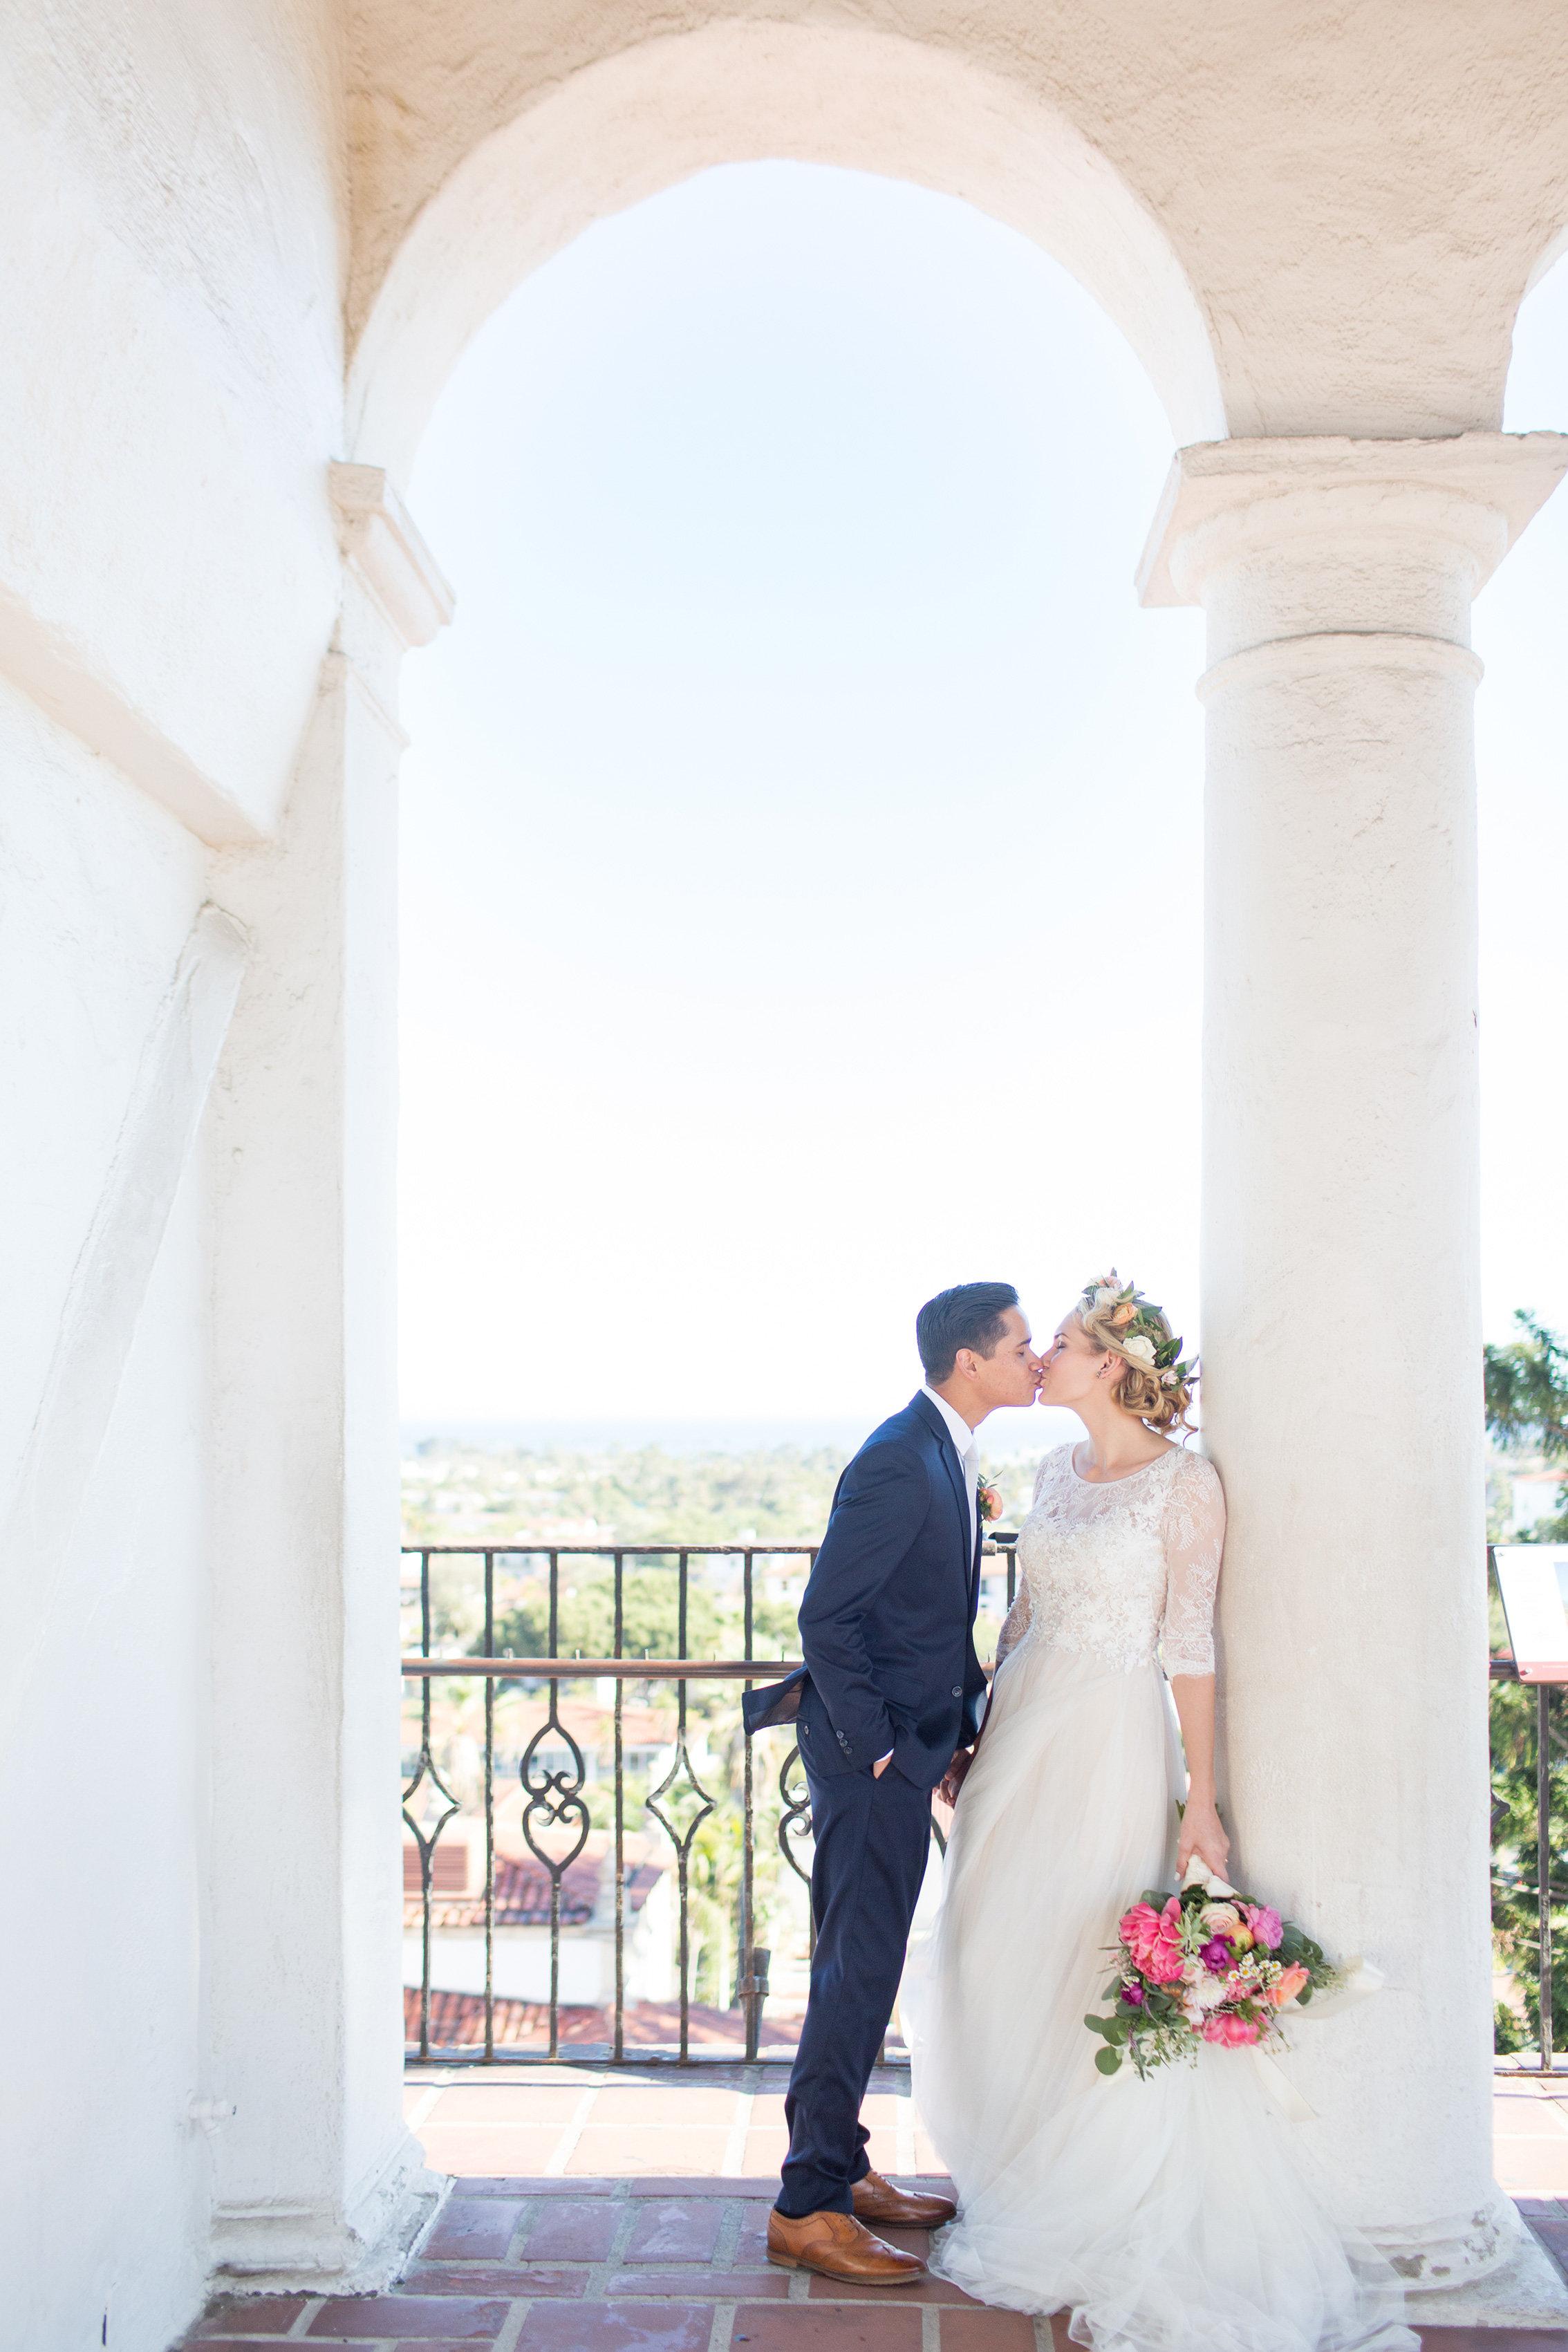 www.santabarbarawedding.com | Anna J Photography | Santa Barbara Courthouse | Bride and Groom